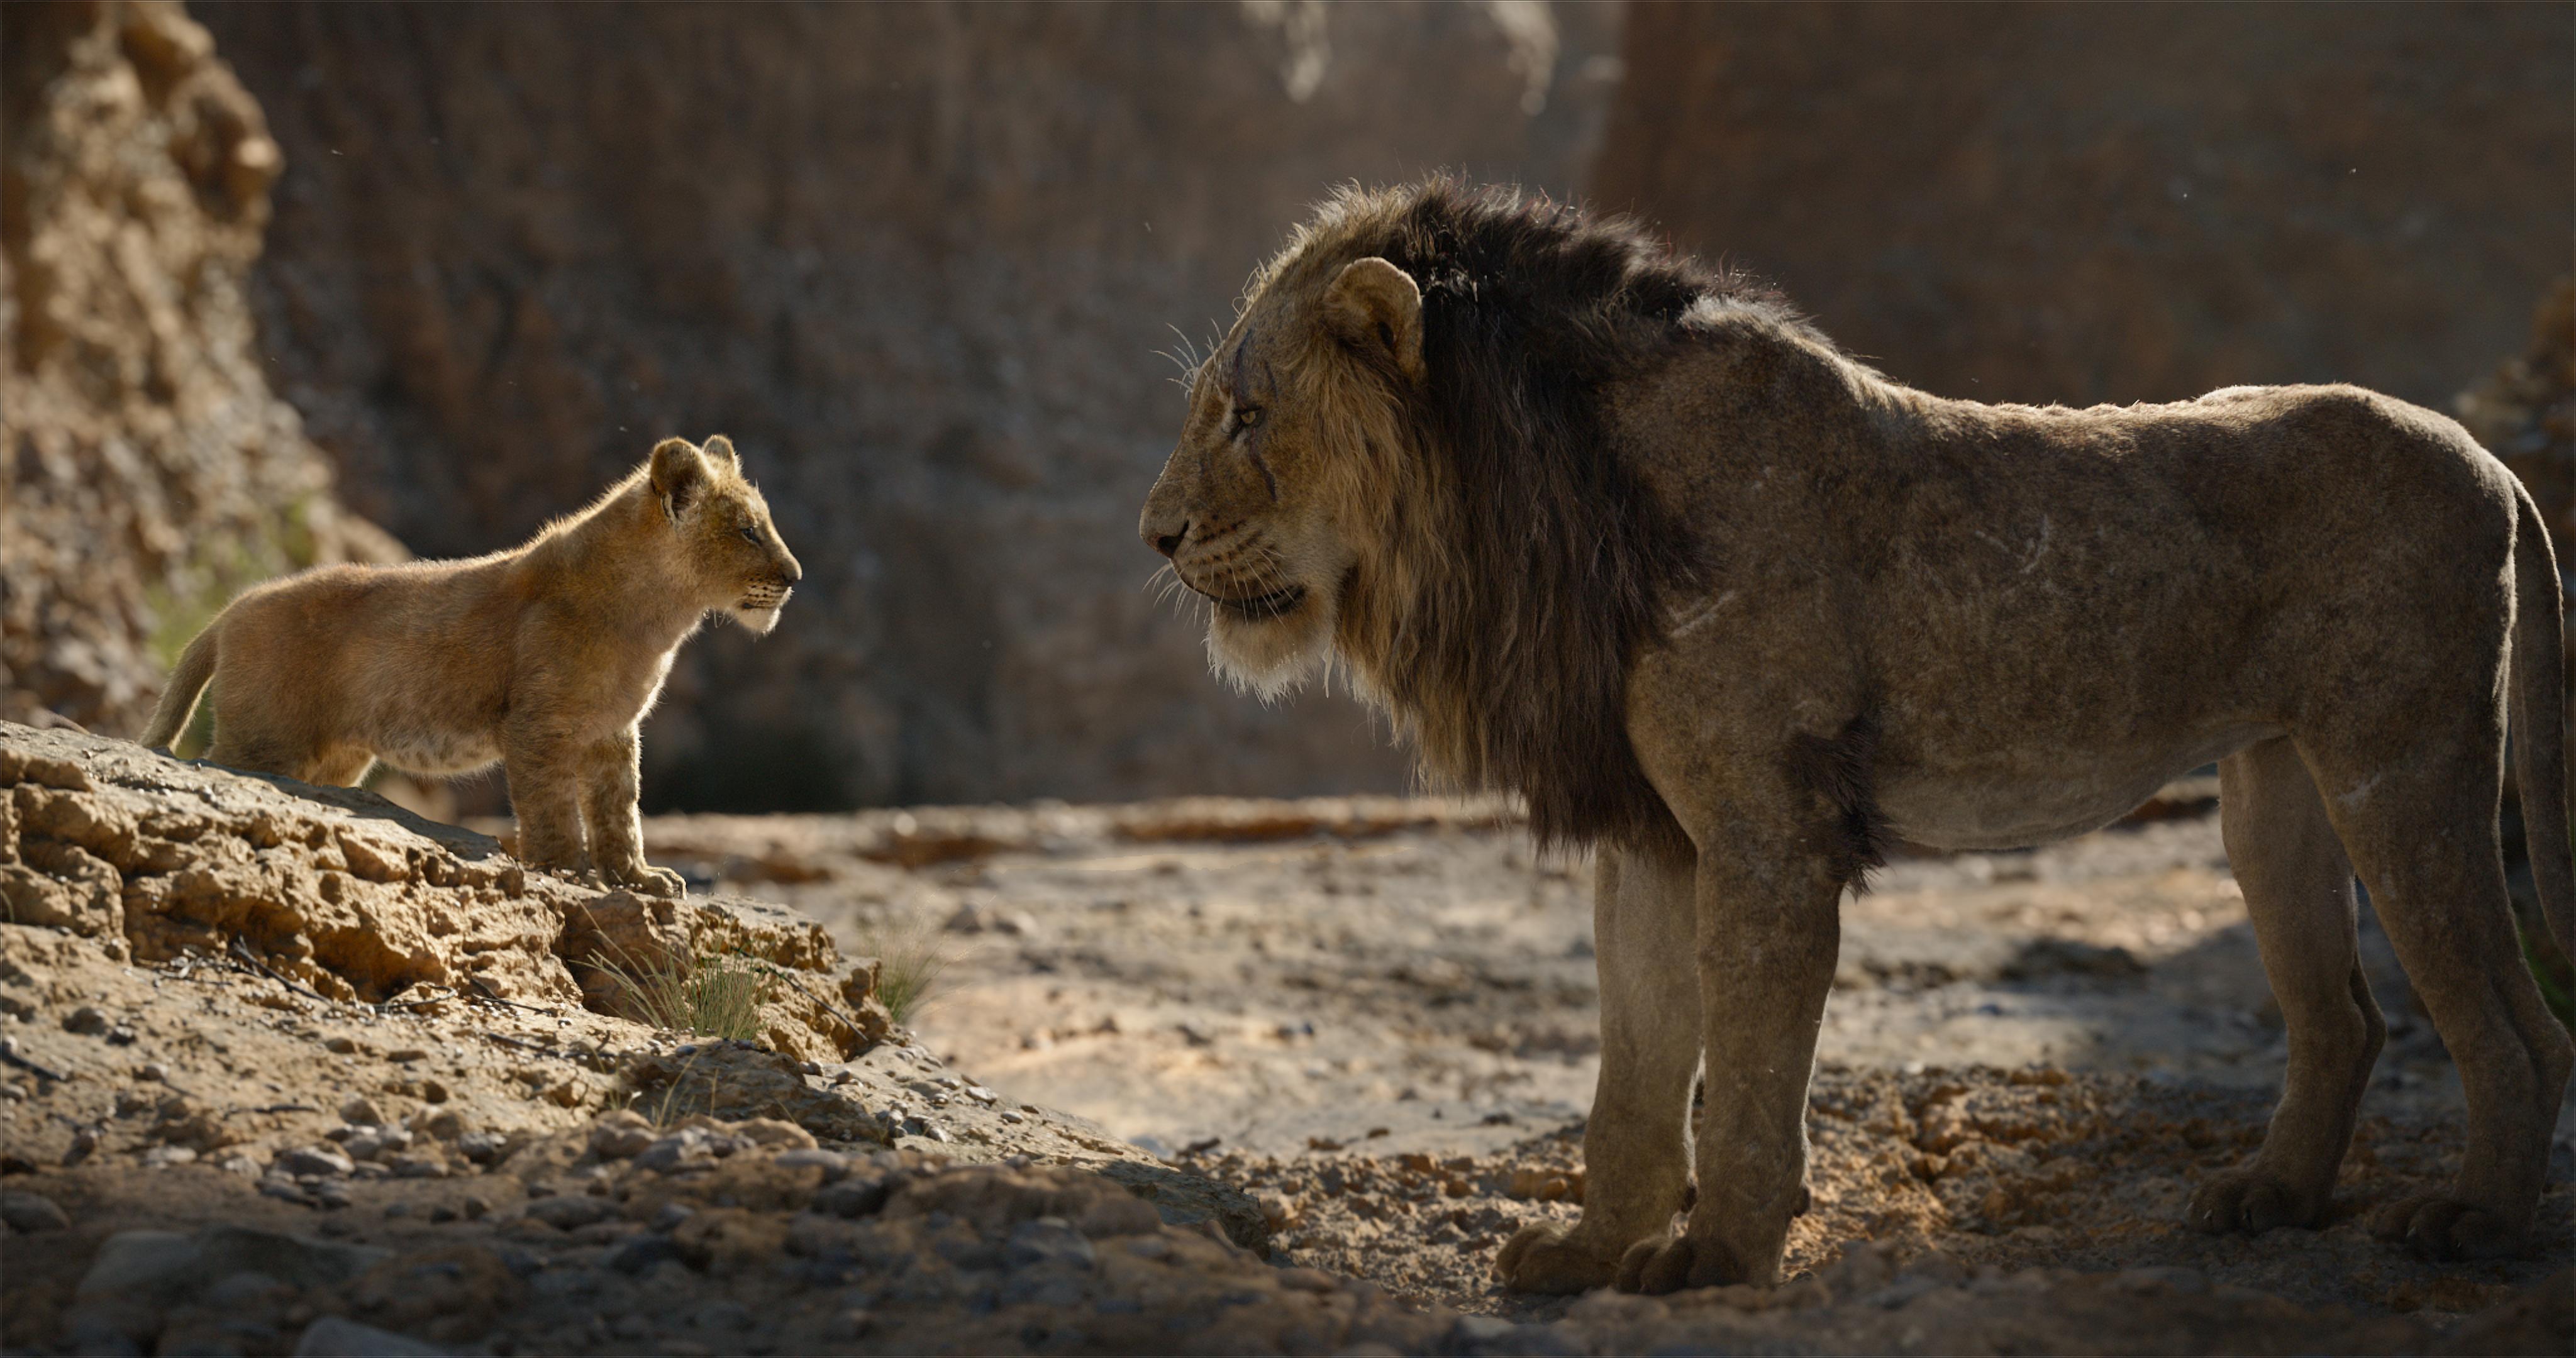 The Lion King (2019) via IMDb